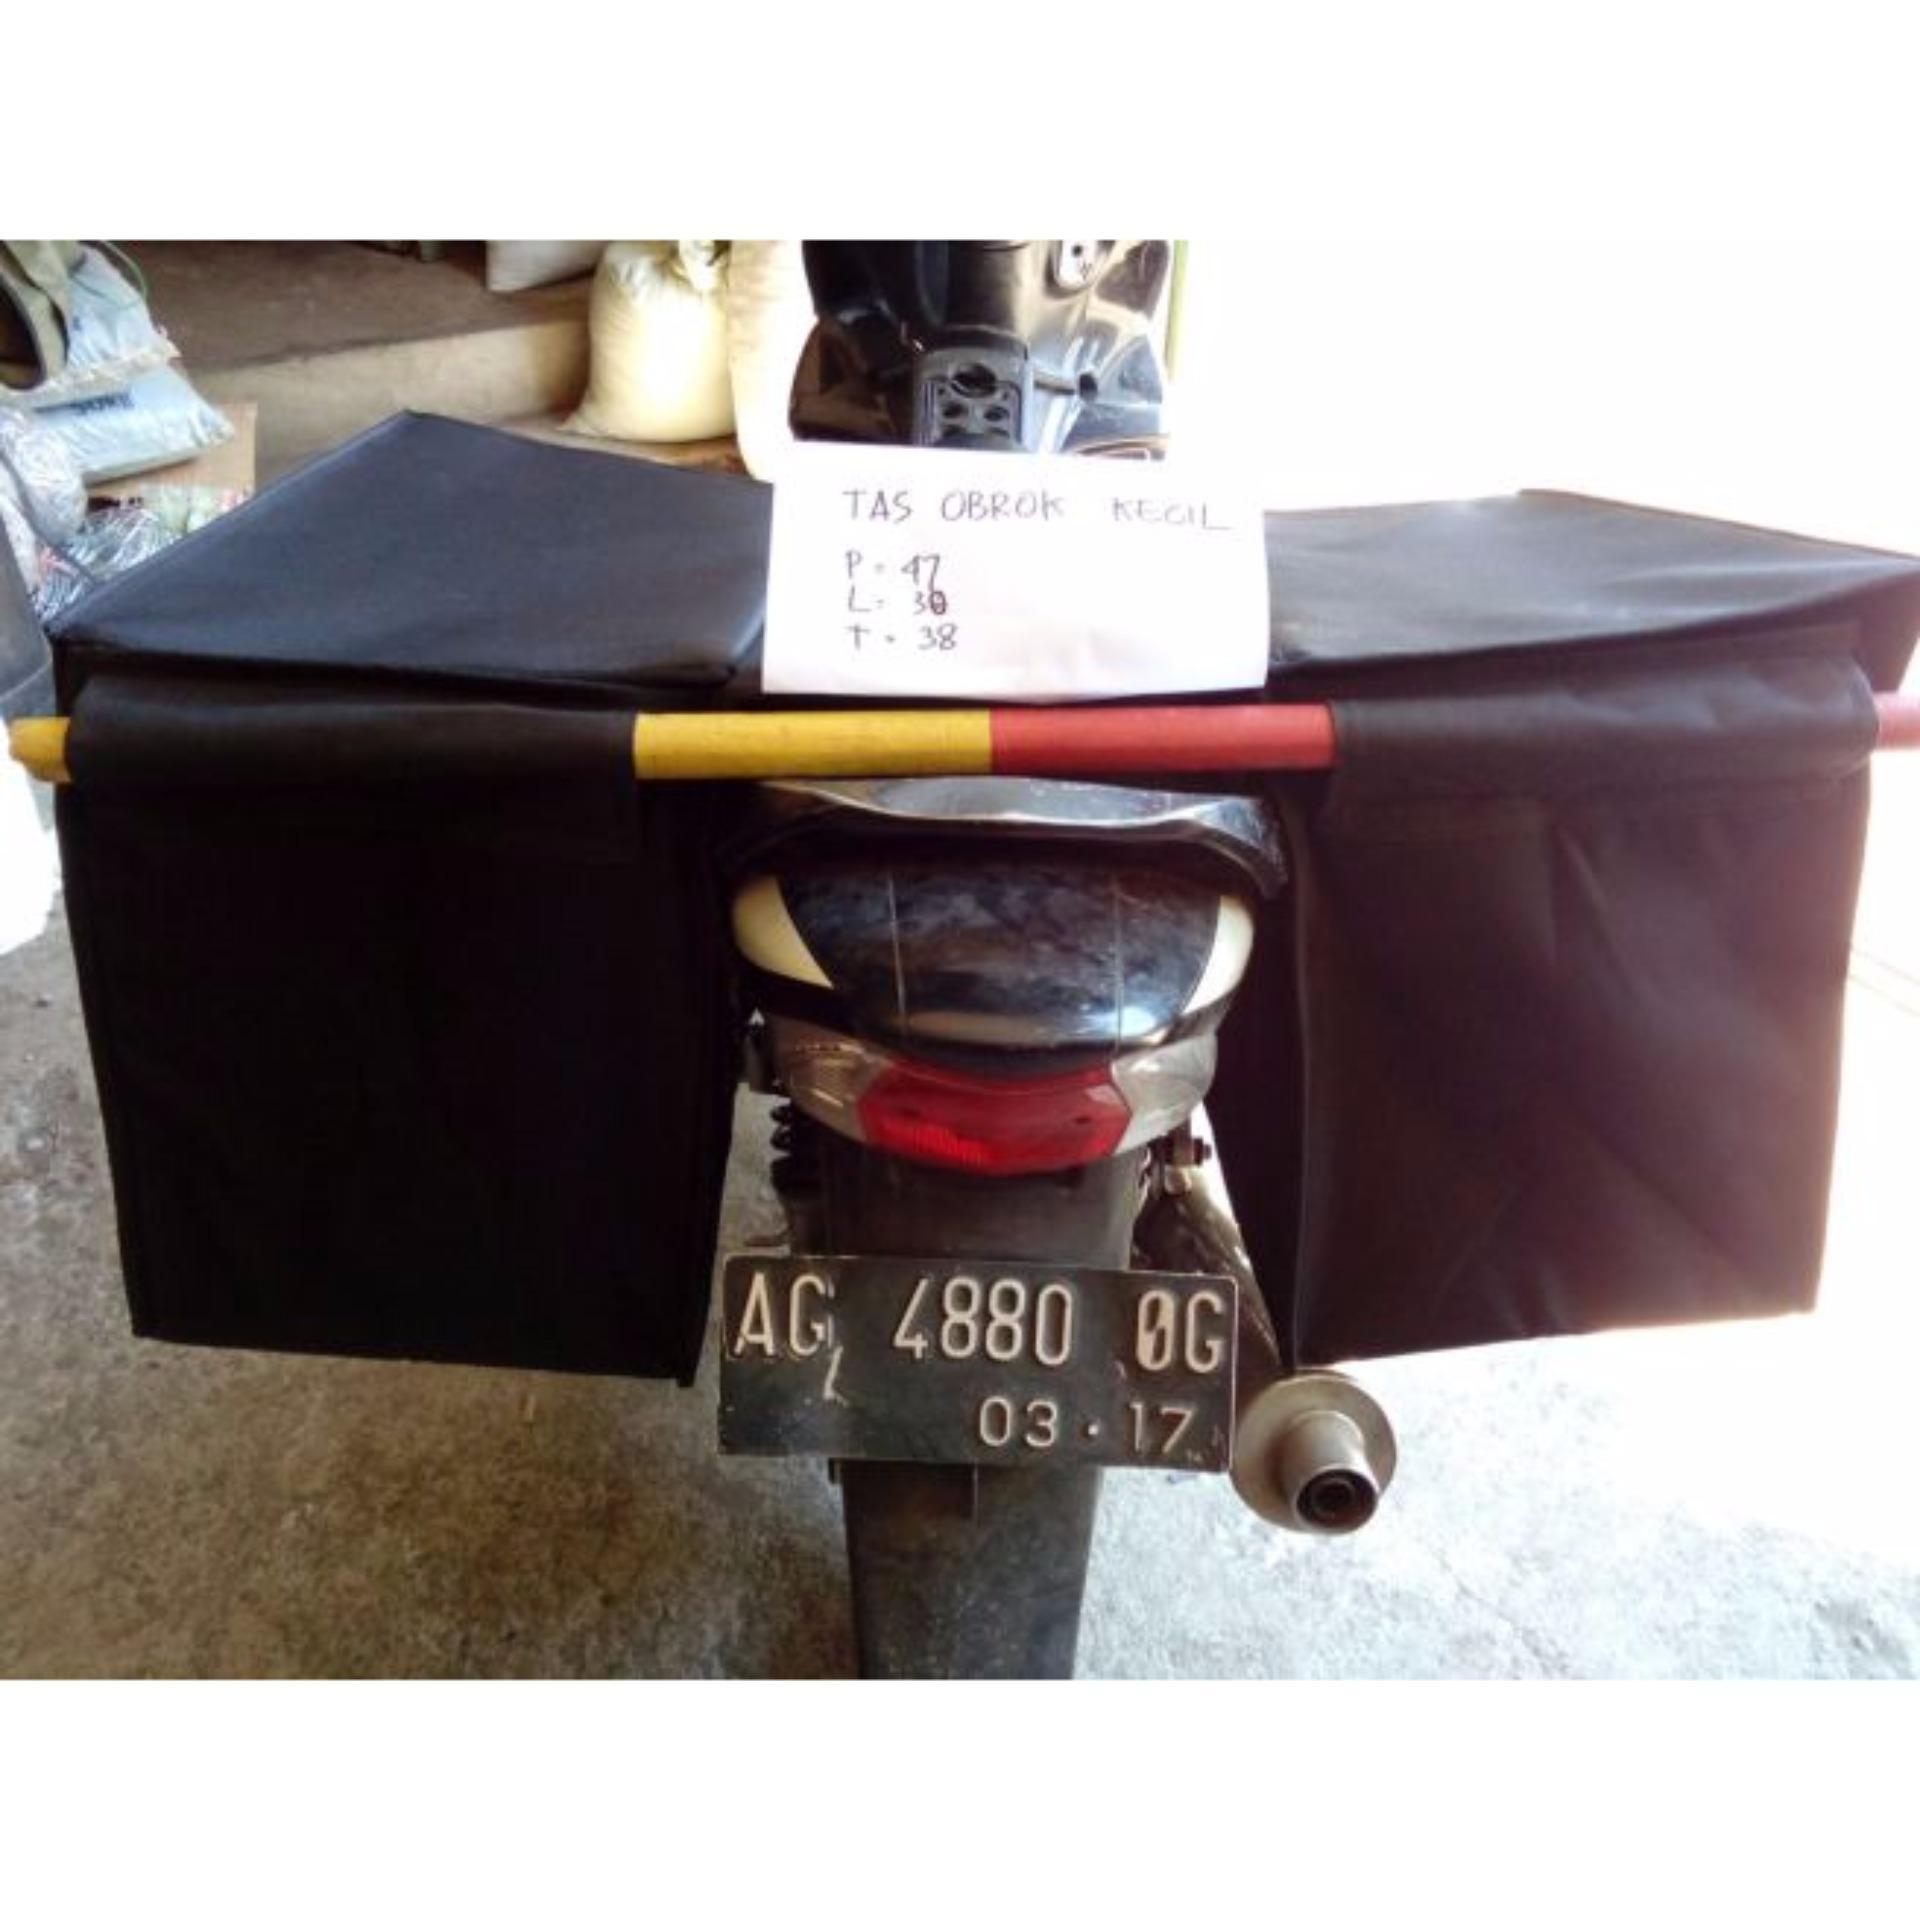 Belanja Murah Tas Obrok Kecil Pos Motor Sales Tabung Jas Hujan Jk Speed